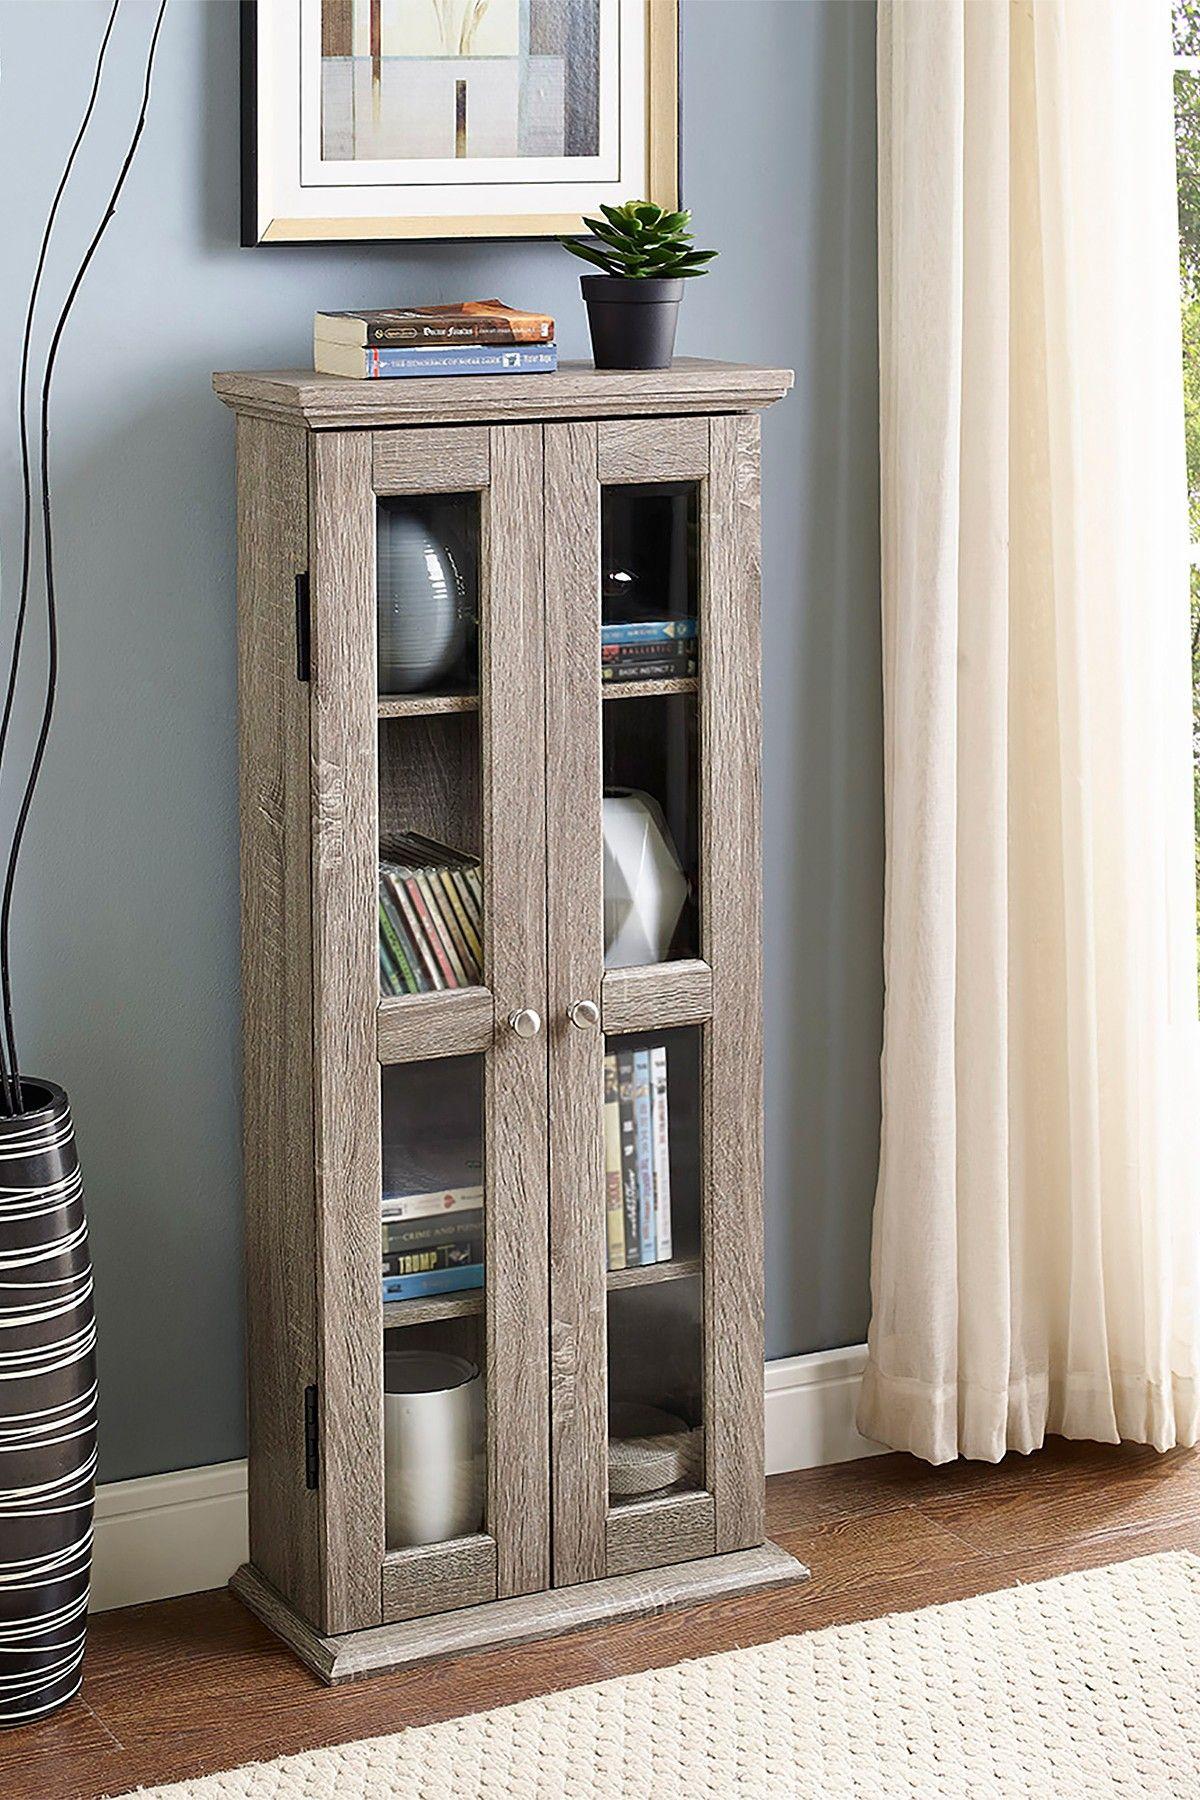 Driftwood Wood Media Storage Tower Cabinet by Walker Edison